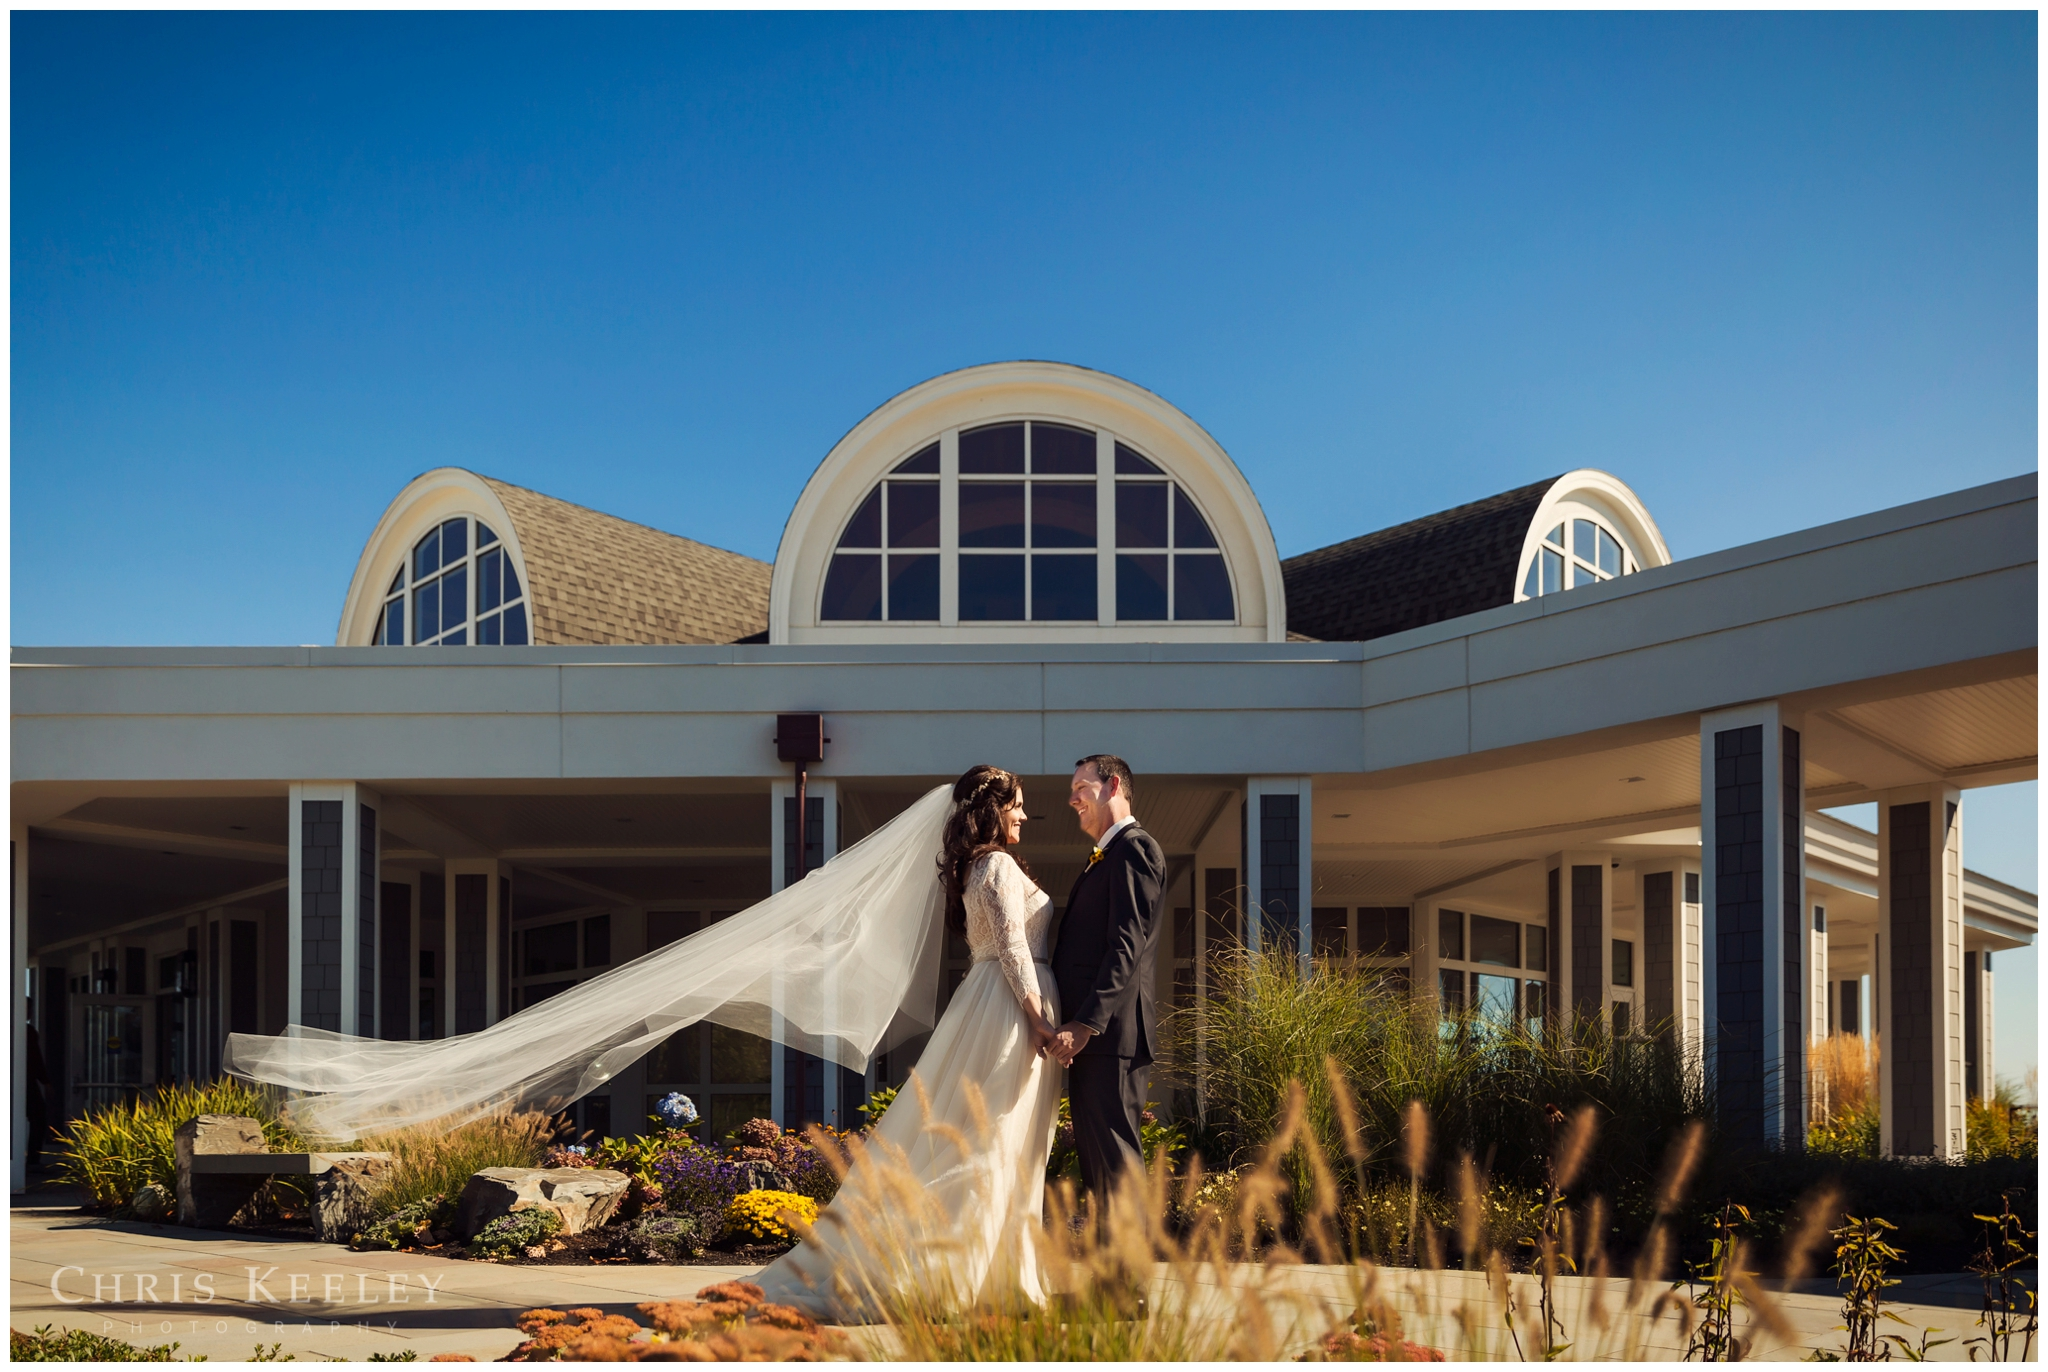 mckenzie-jeff-cliff-house-wedding-new-hampshire-wedding-photographer-chris-keeley-21.jpg